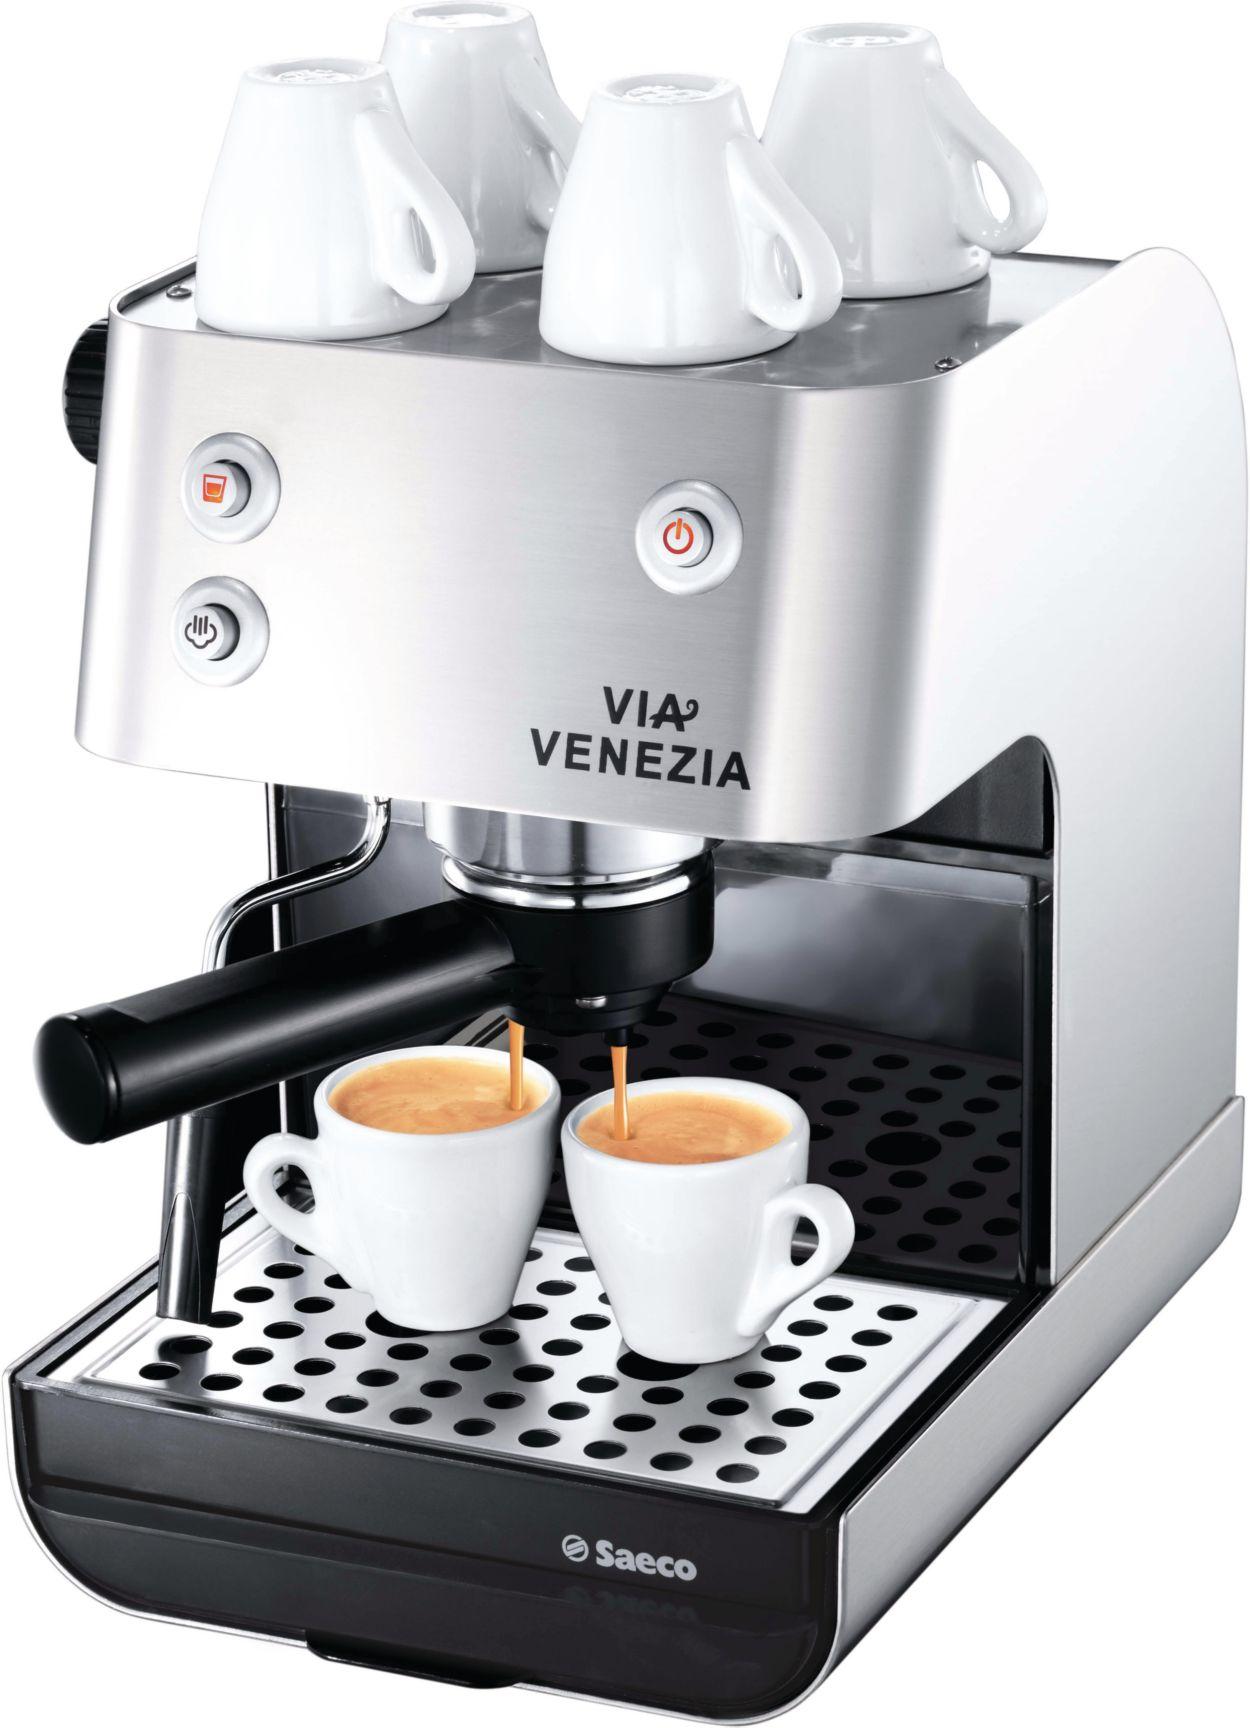 Electronic Saeco Coffee Machine Manual via venezia manual espresso machine ri936701 saeco taste the full aroma of your espresso